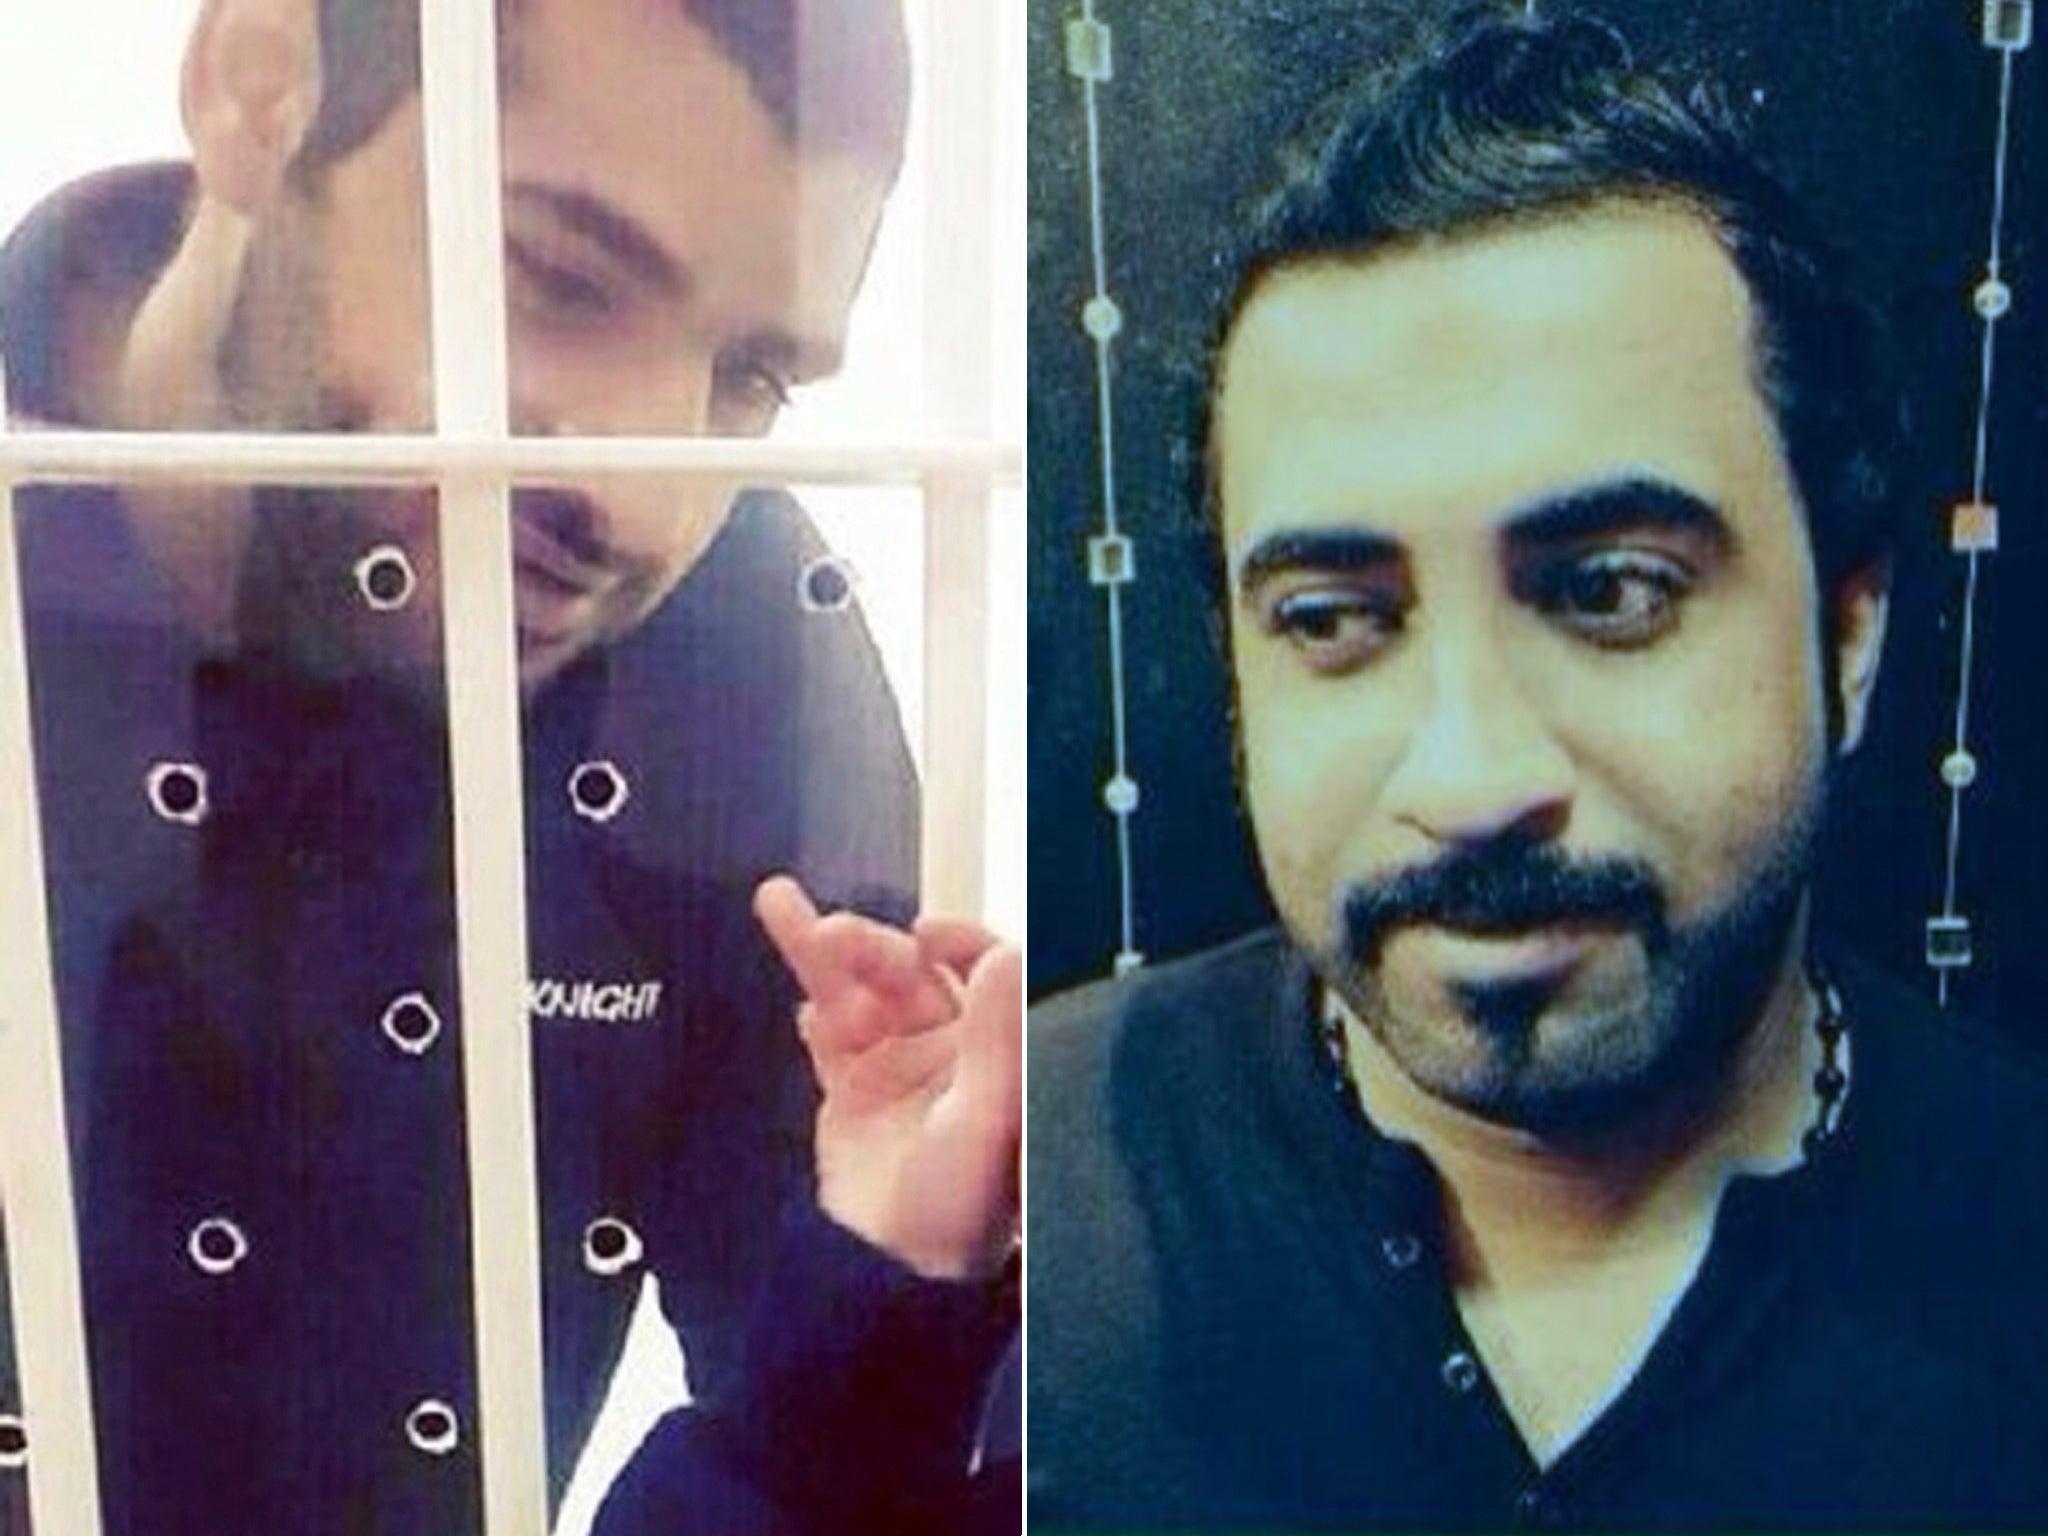 UK government under pressure to intervene after Bahrain upholds death sentences for activists 'tortured into confessions'